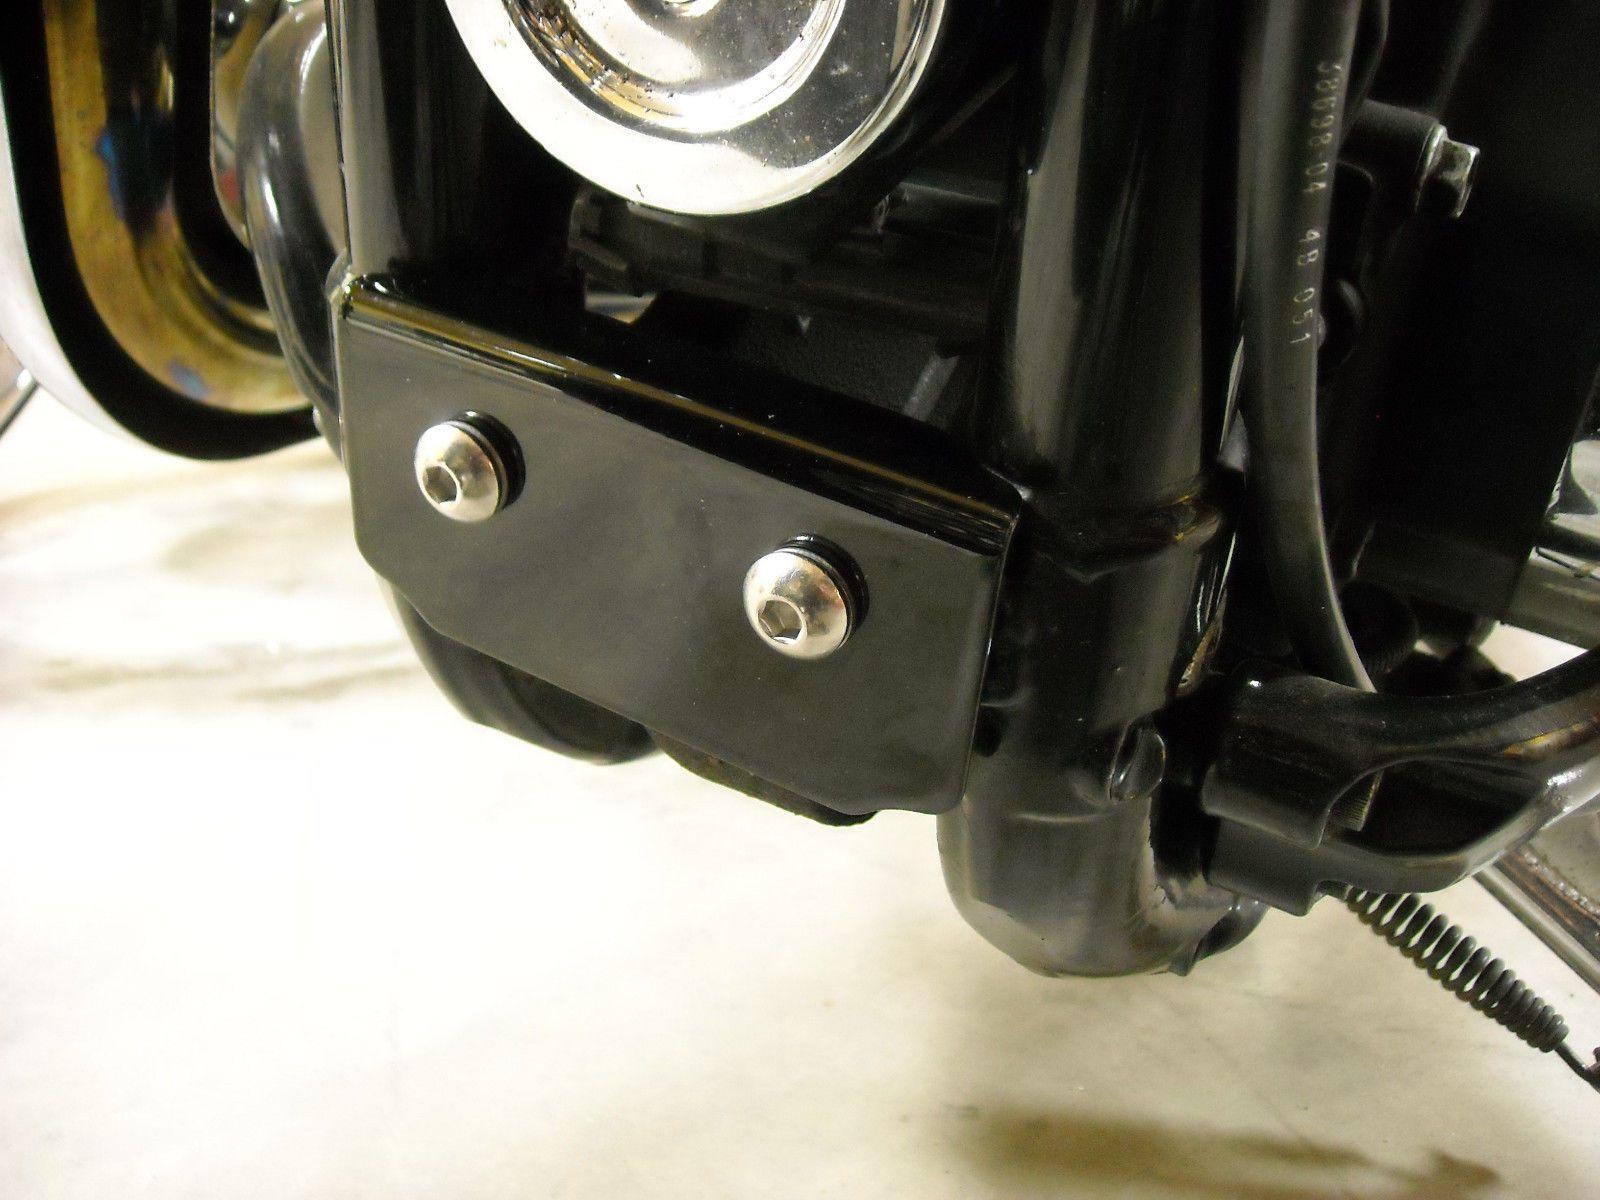 Harley Sportster Lower Motor Mount Cover 2004 To 2016 Black Harley Davidson Sportster Sportster Motor